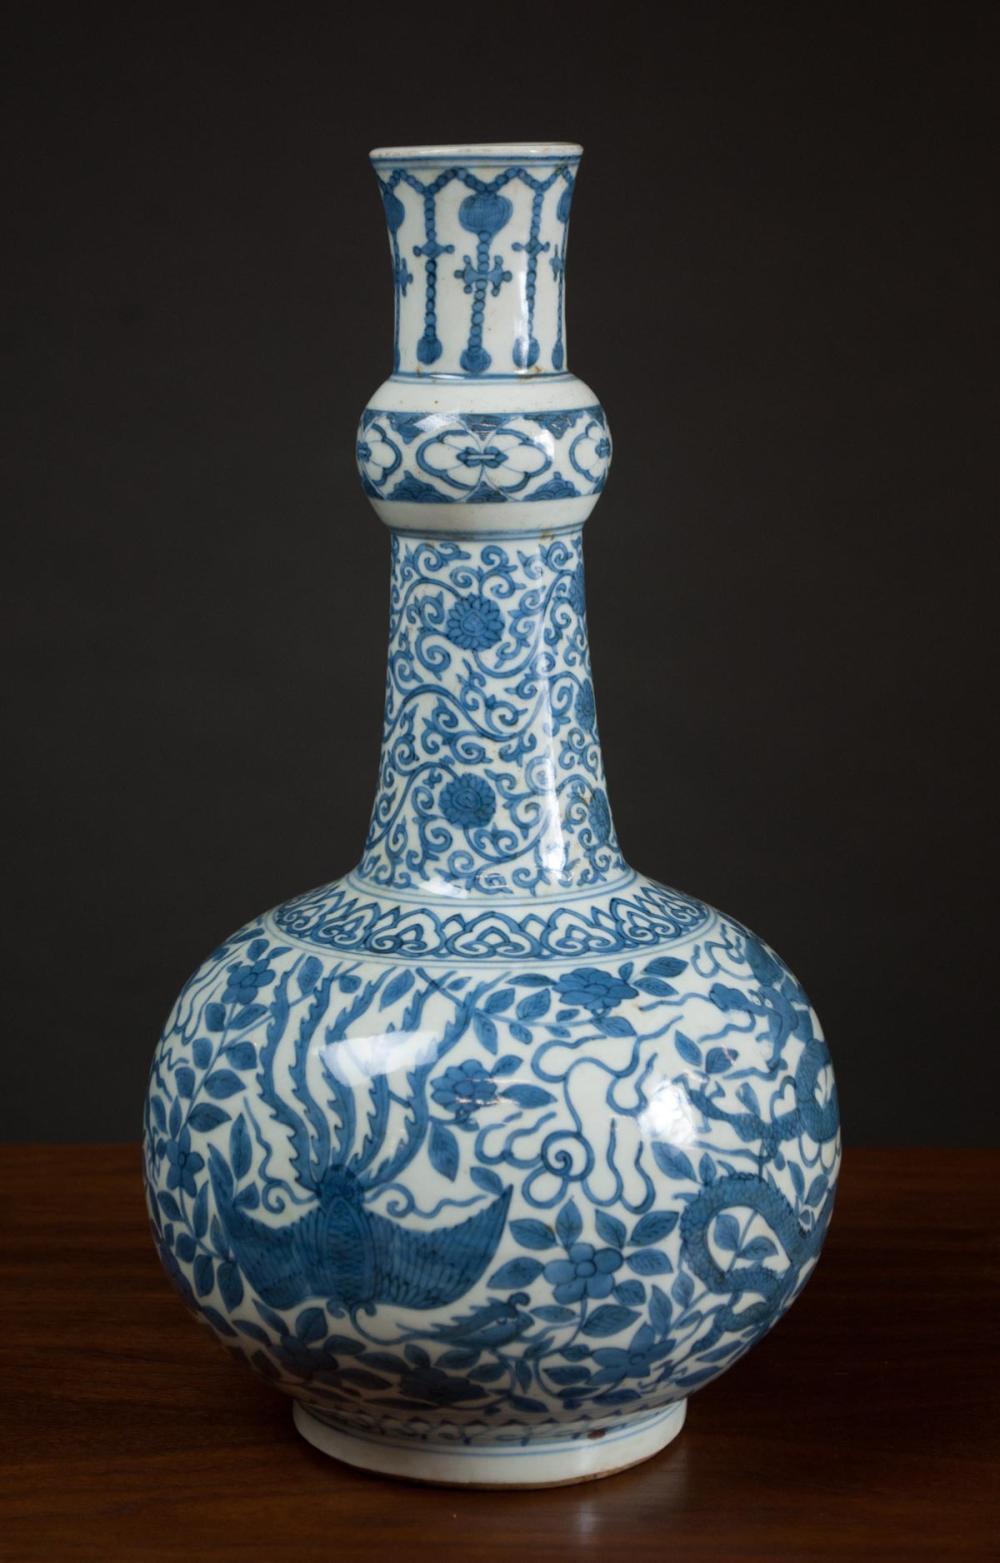 Lot 323: CHINESE BLUE AND WHITE PORCELAIN VASE, with elonga